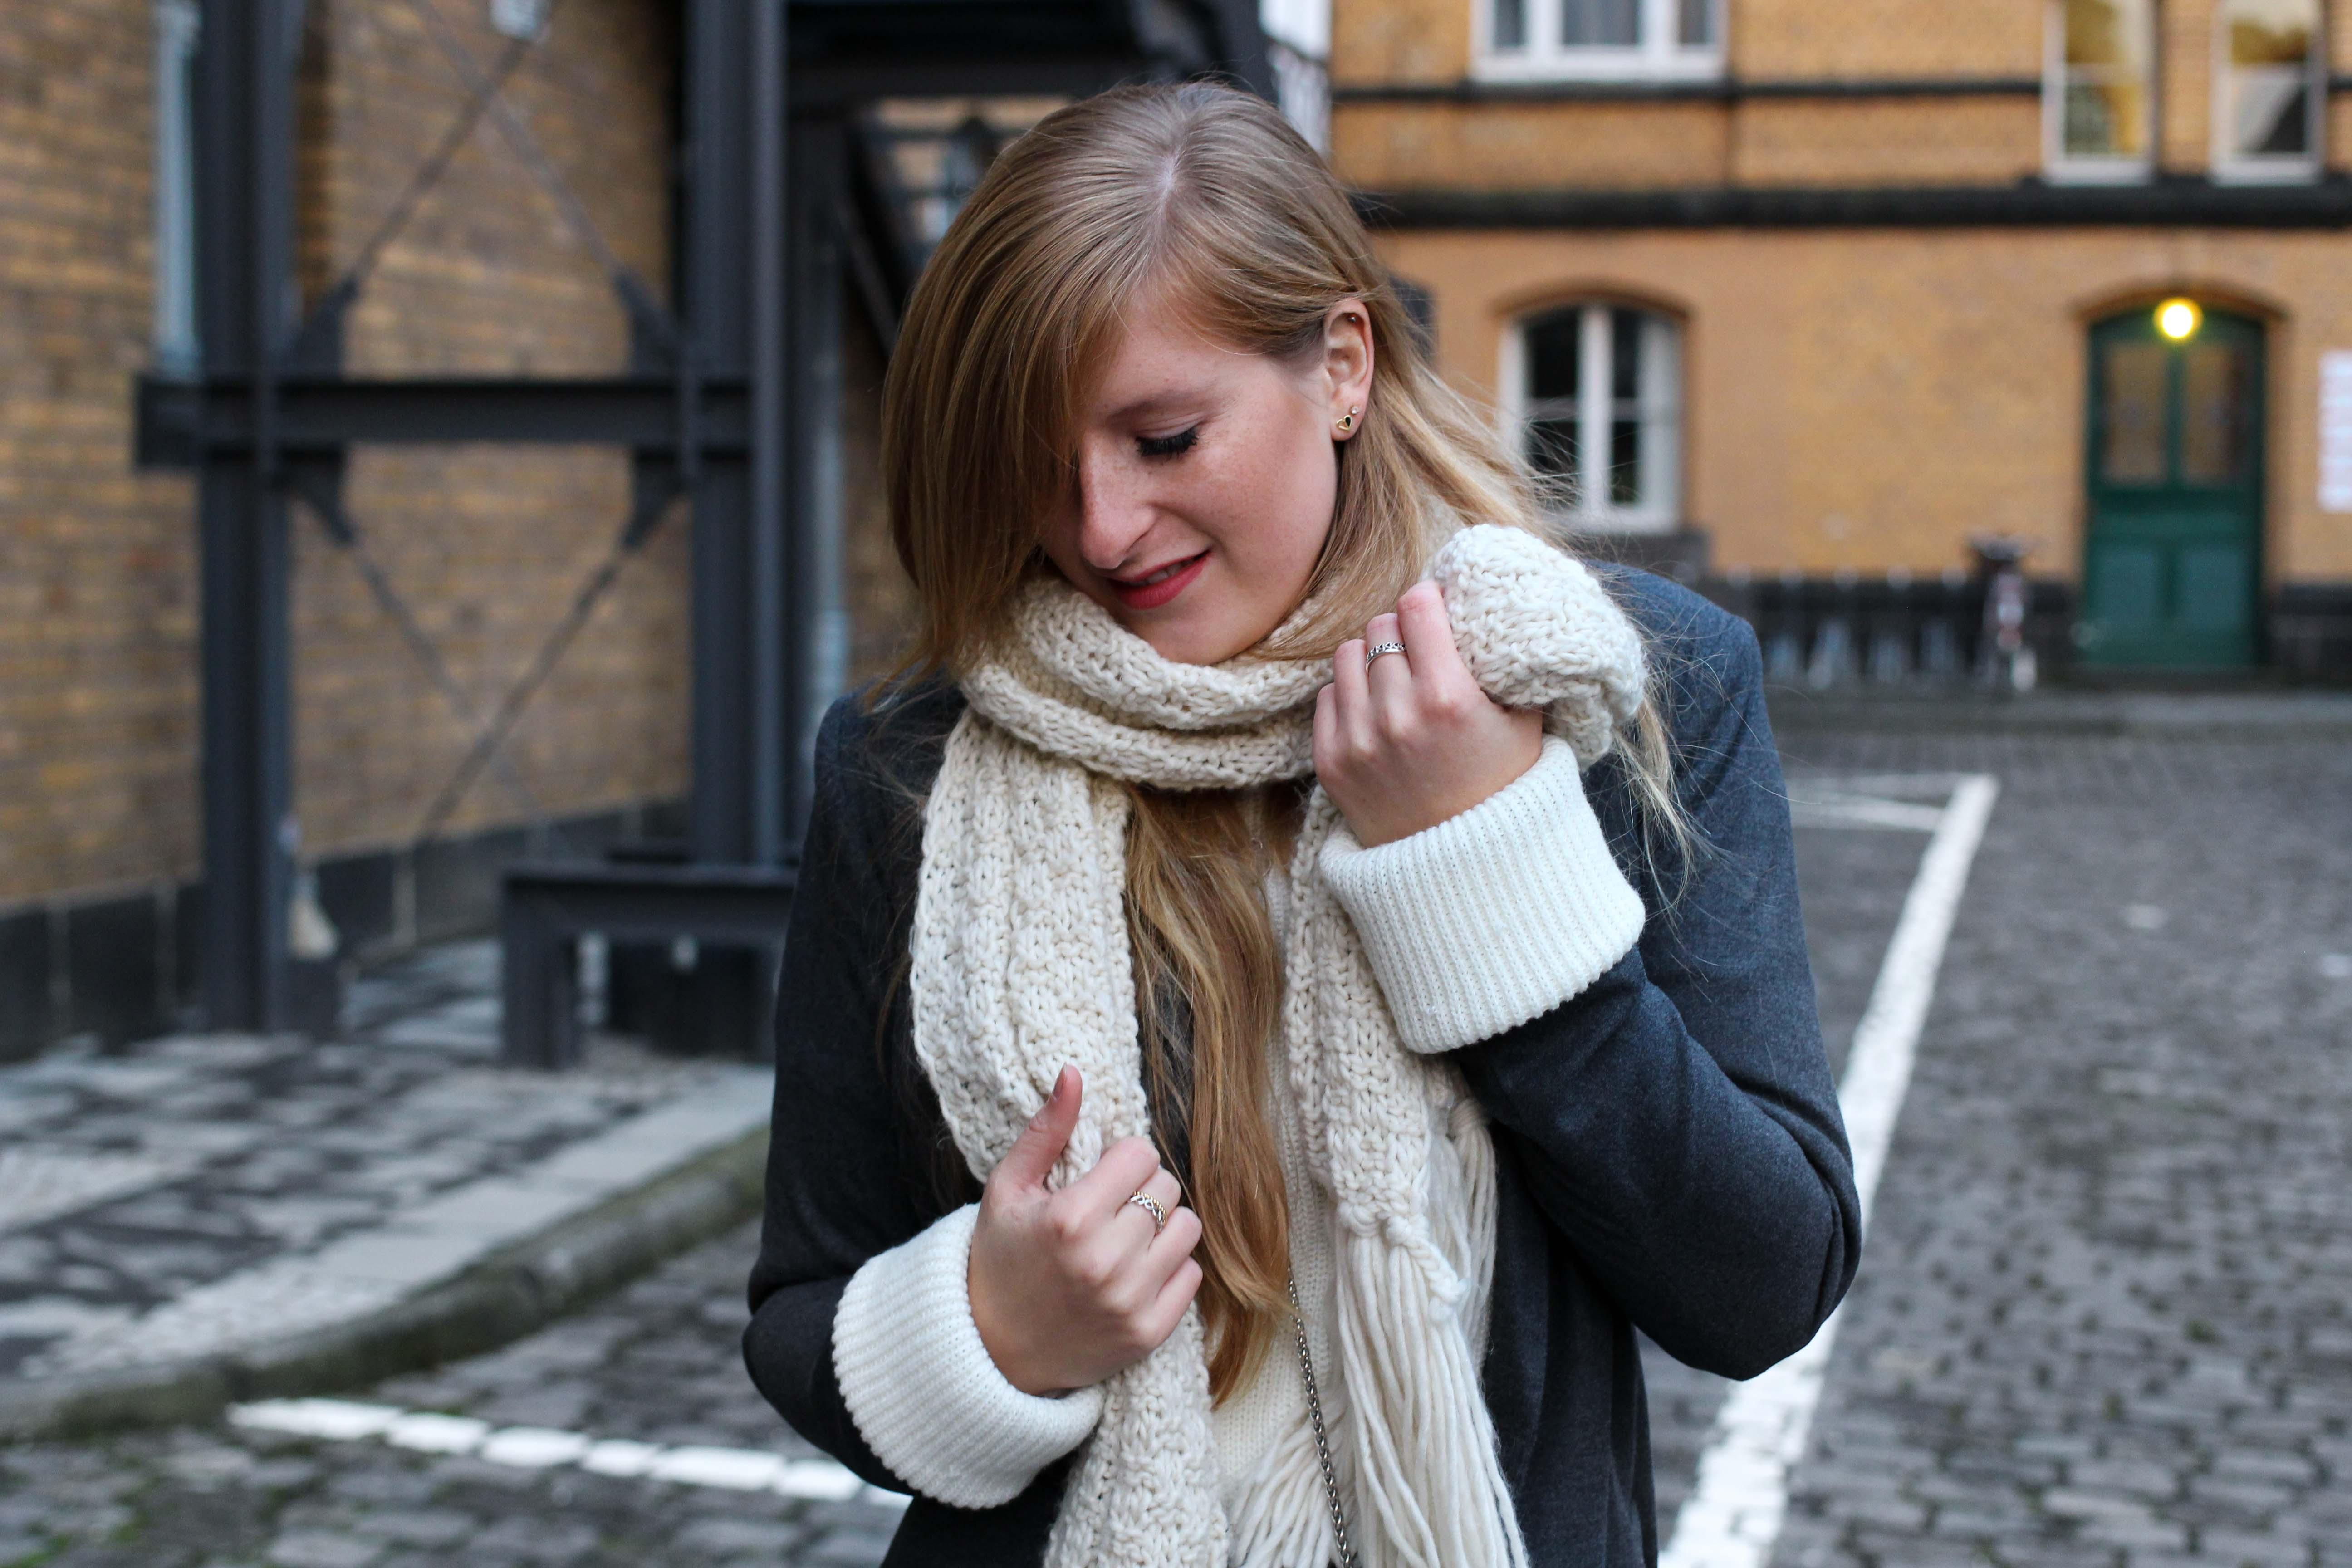 Winter-Layering weißes Kleid, Ripped Pullover Asos schwarze Strumpfhose Hunkemöller kombinieren Outfit Modeblog bonn 9